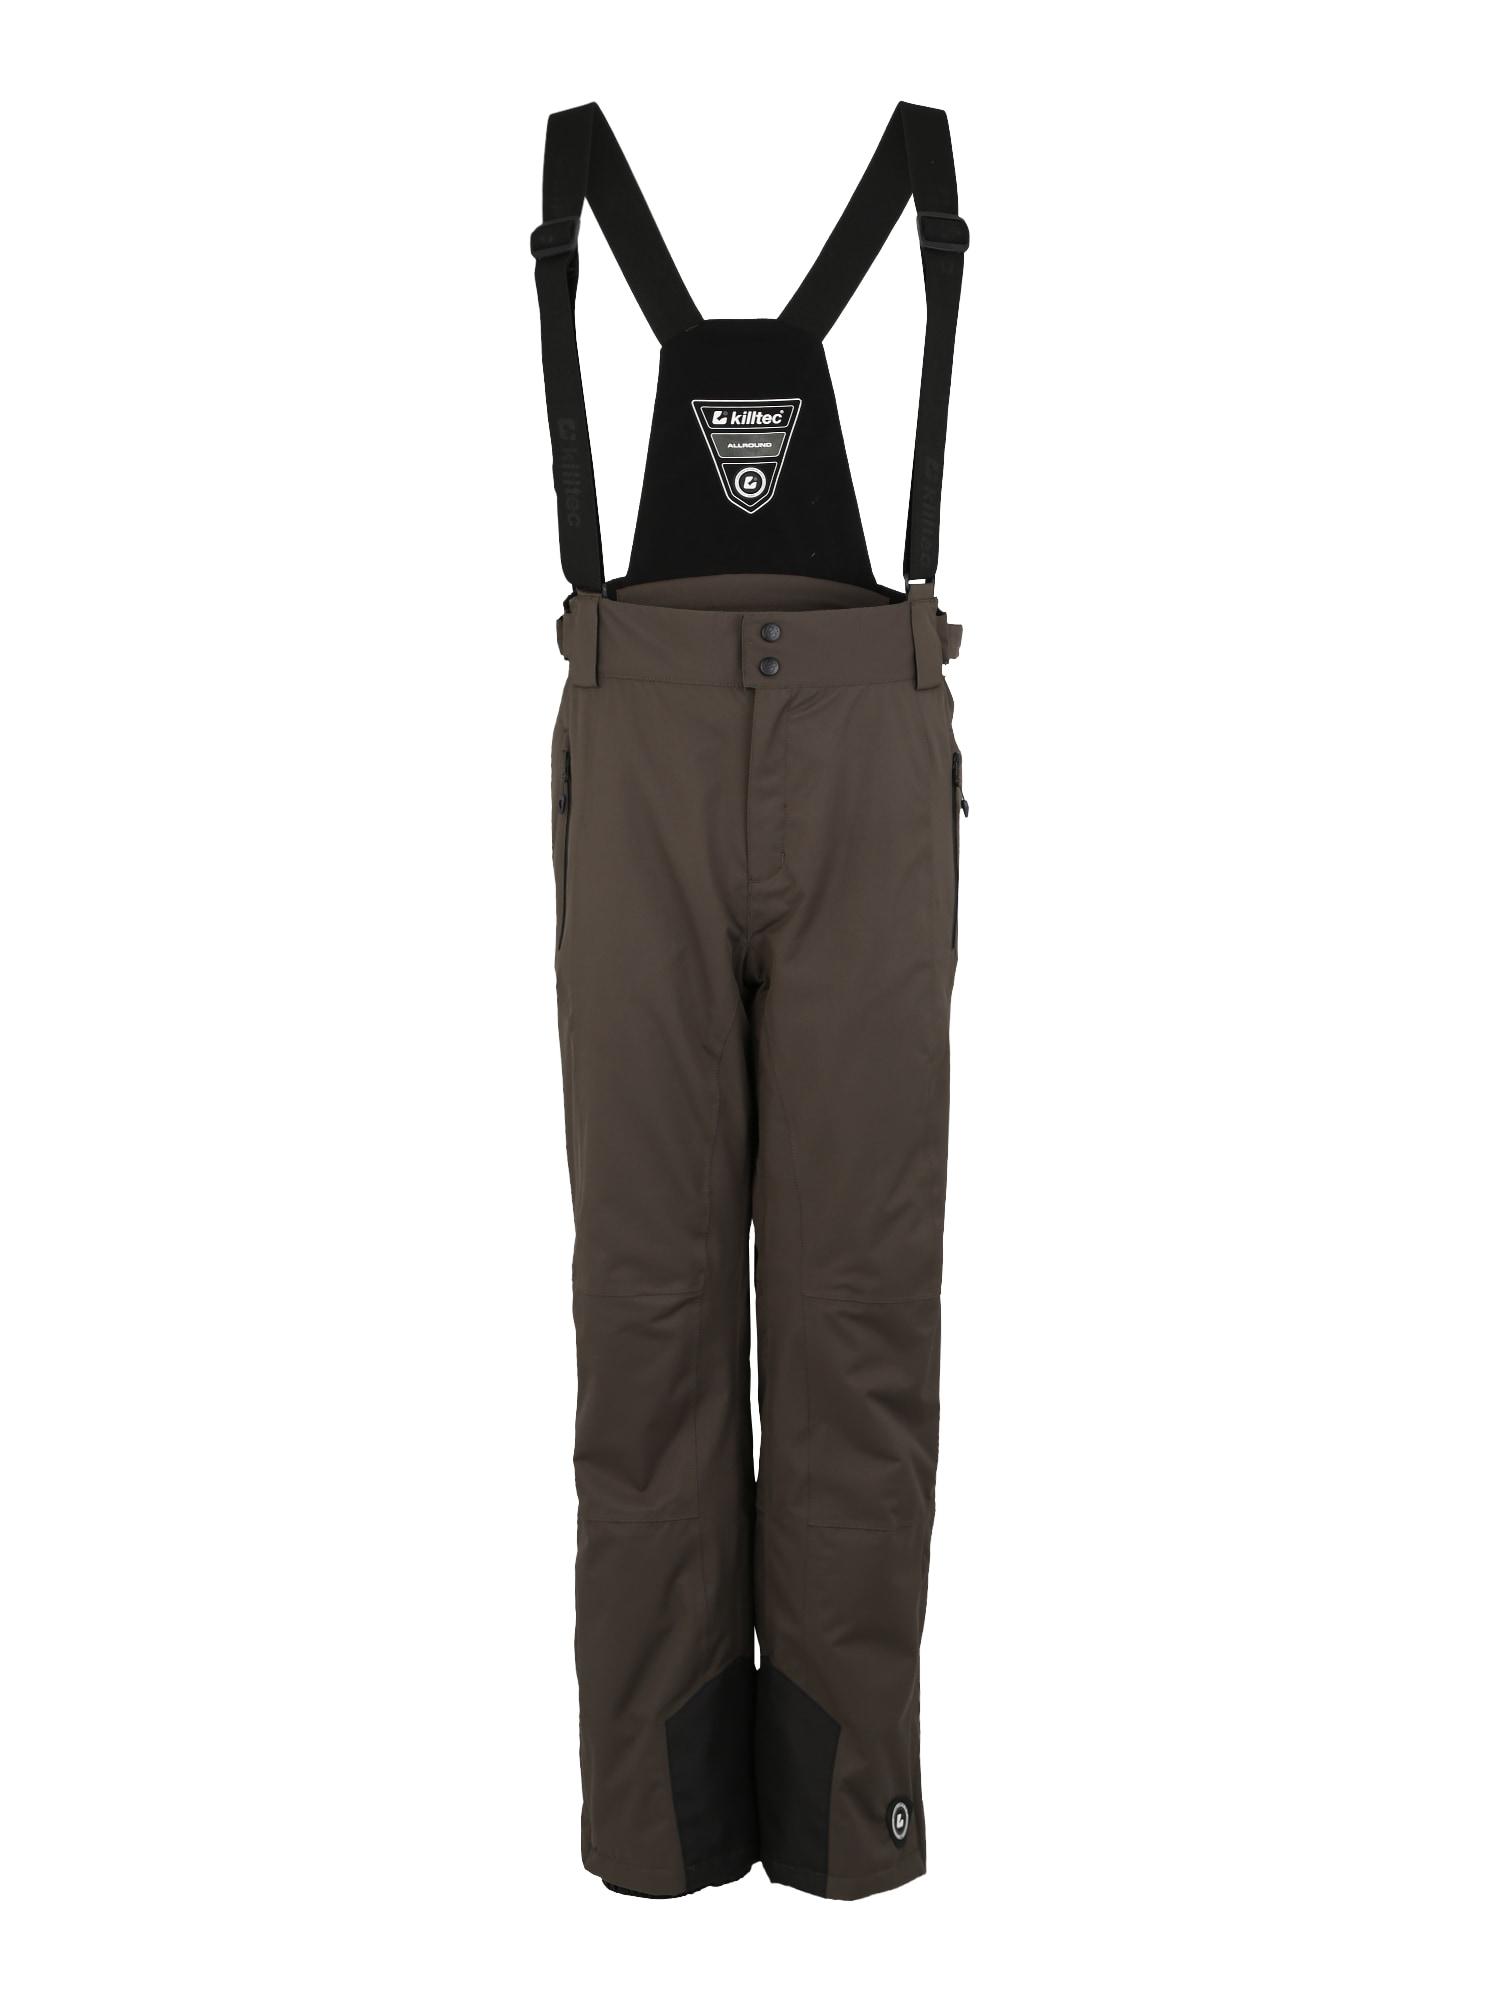 Outdoorové kalhoty Enosh olivová KILLTEC